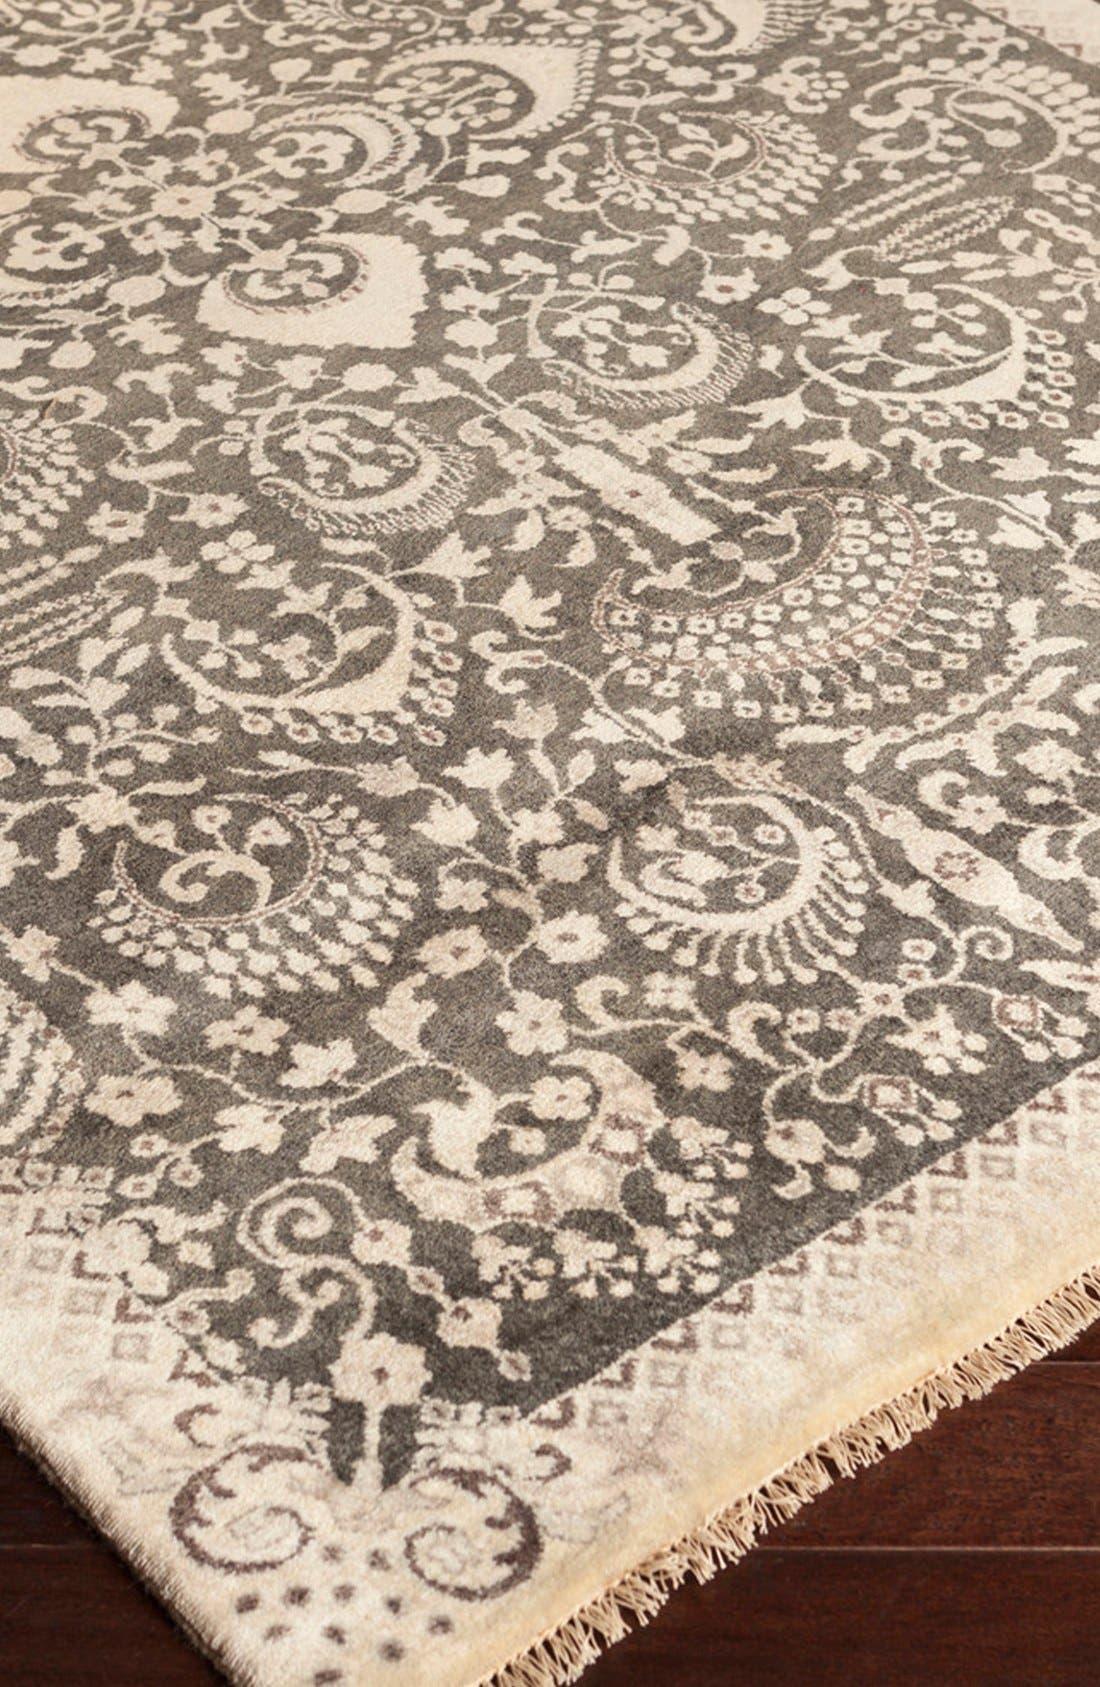 'Empress' Wool Rug,                             Alternate thumbnail 2, color,                             250